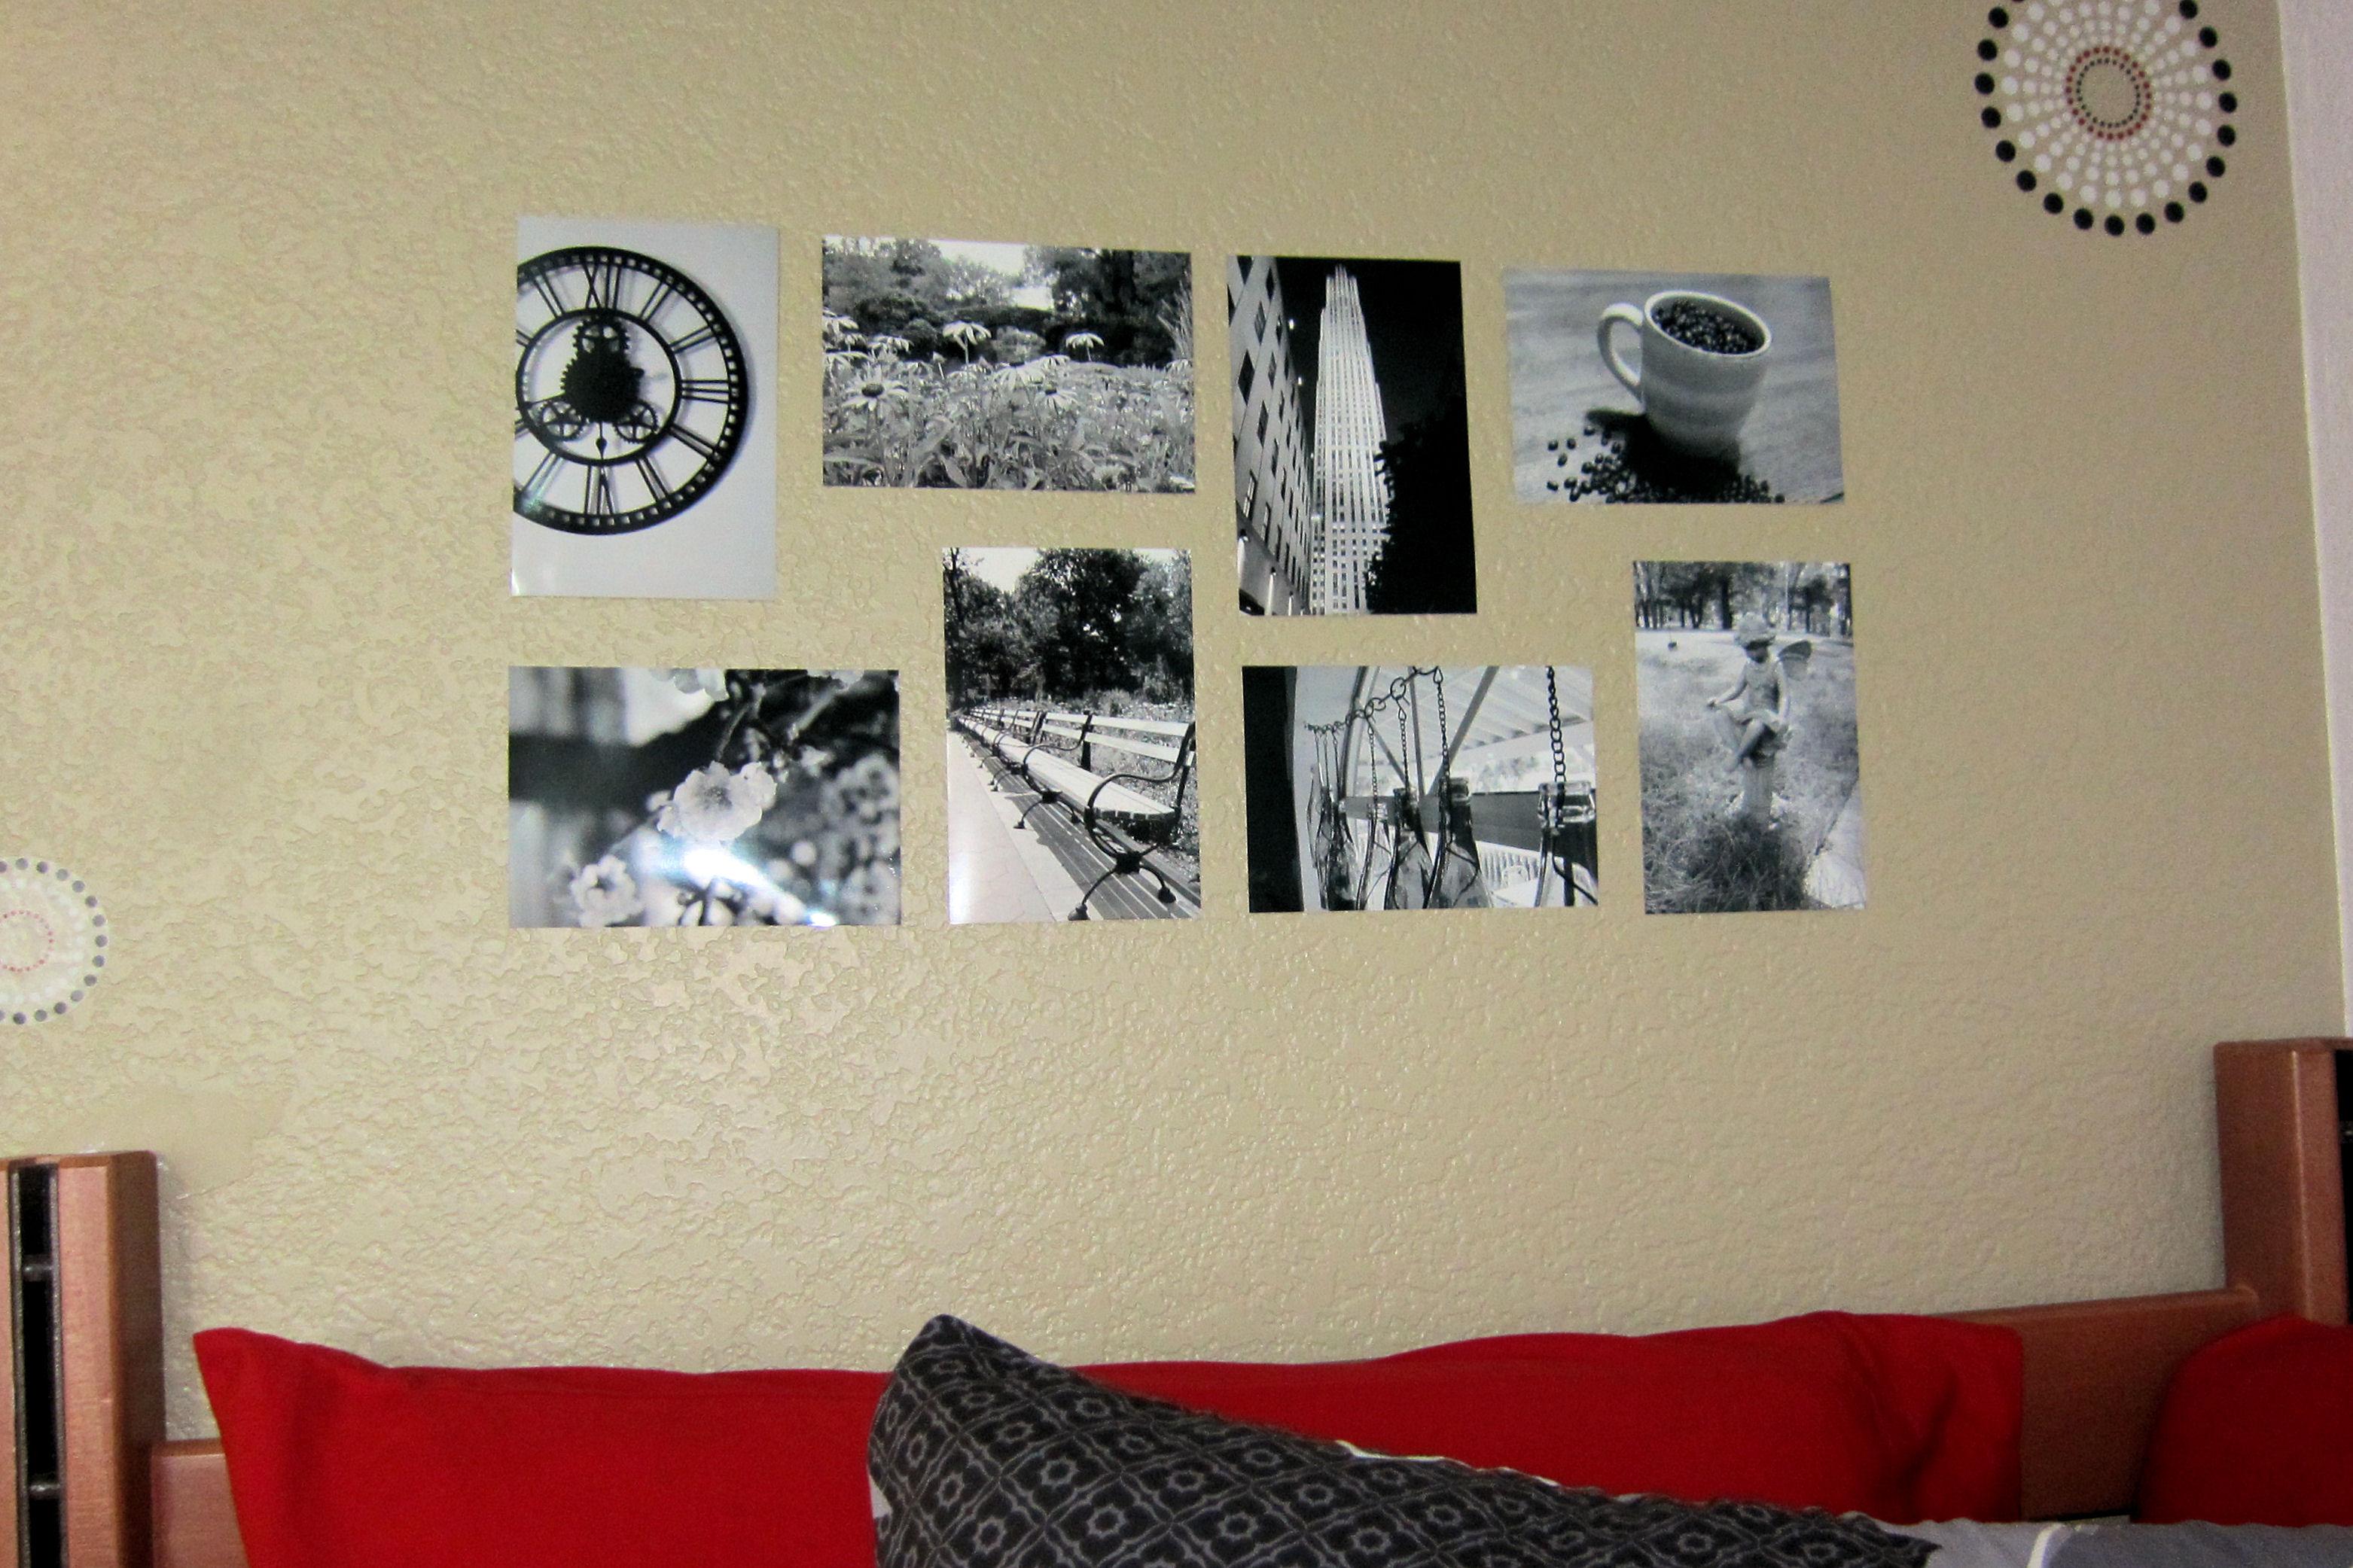 Dorm Room Wall Decorations Diy Viewing Gallery